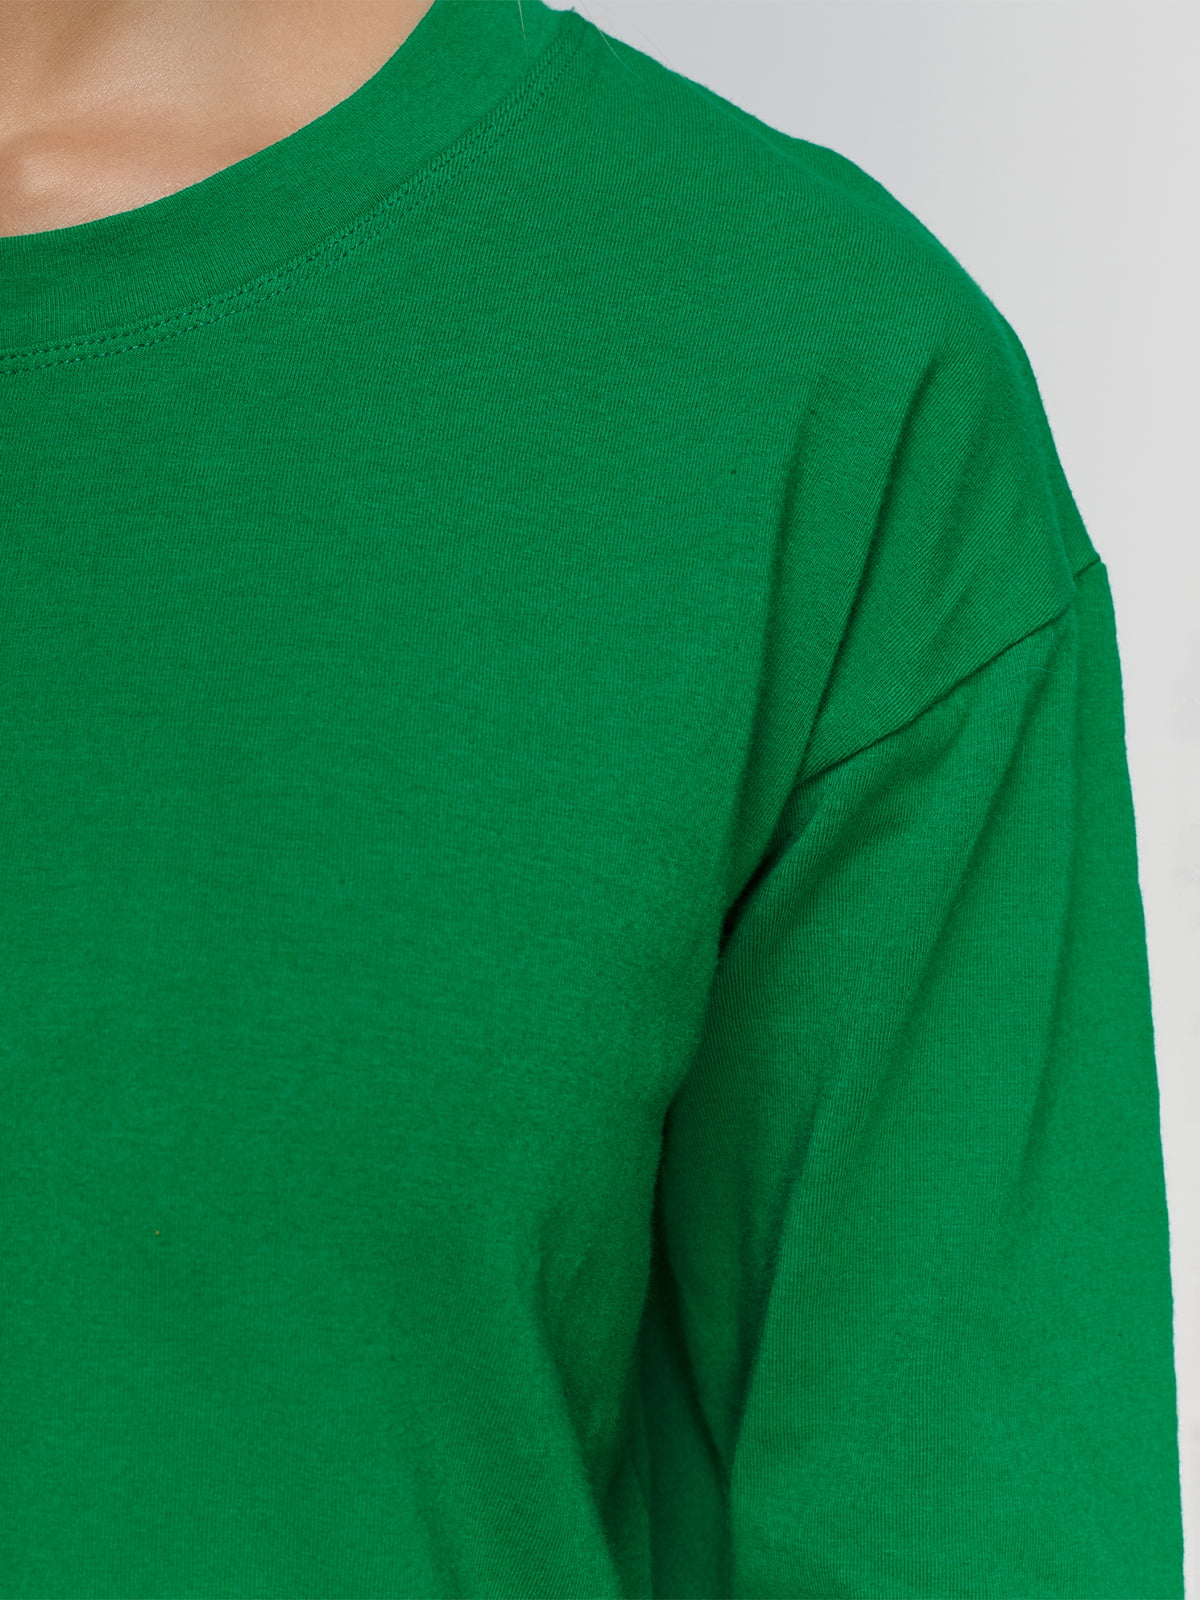 Футболка зелена   4768973   фото 3